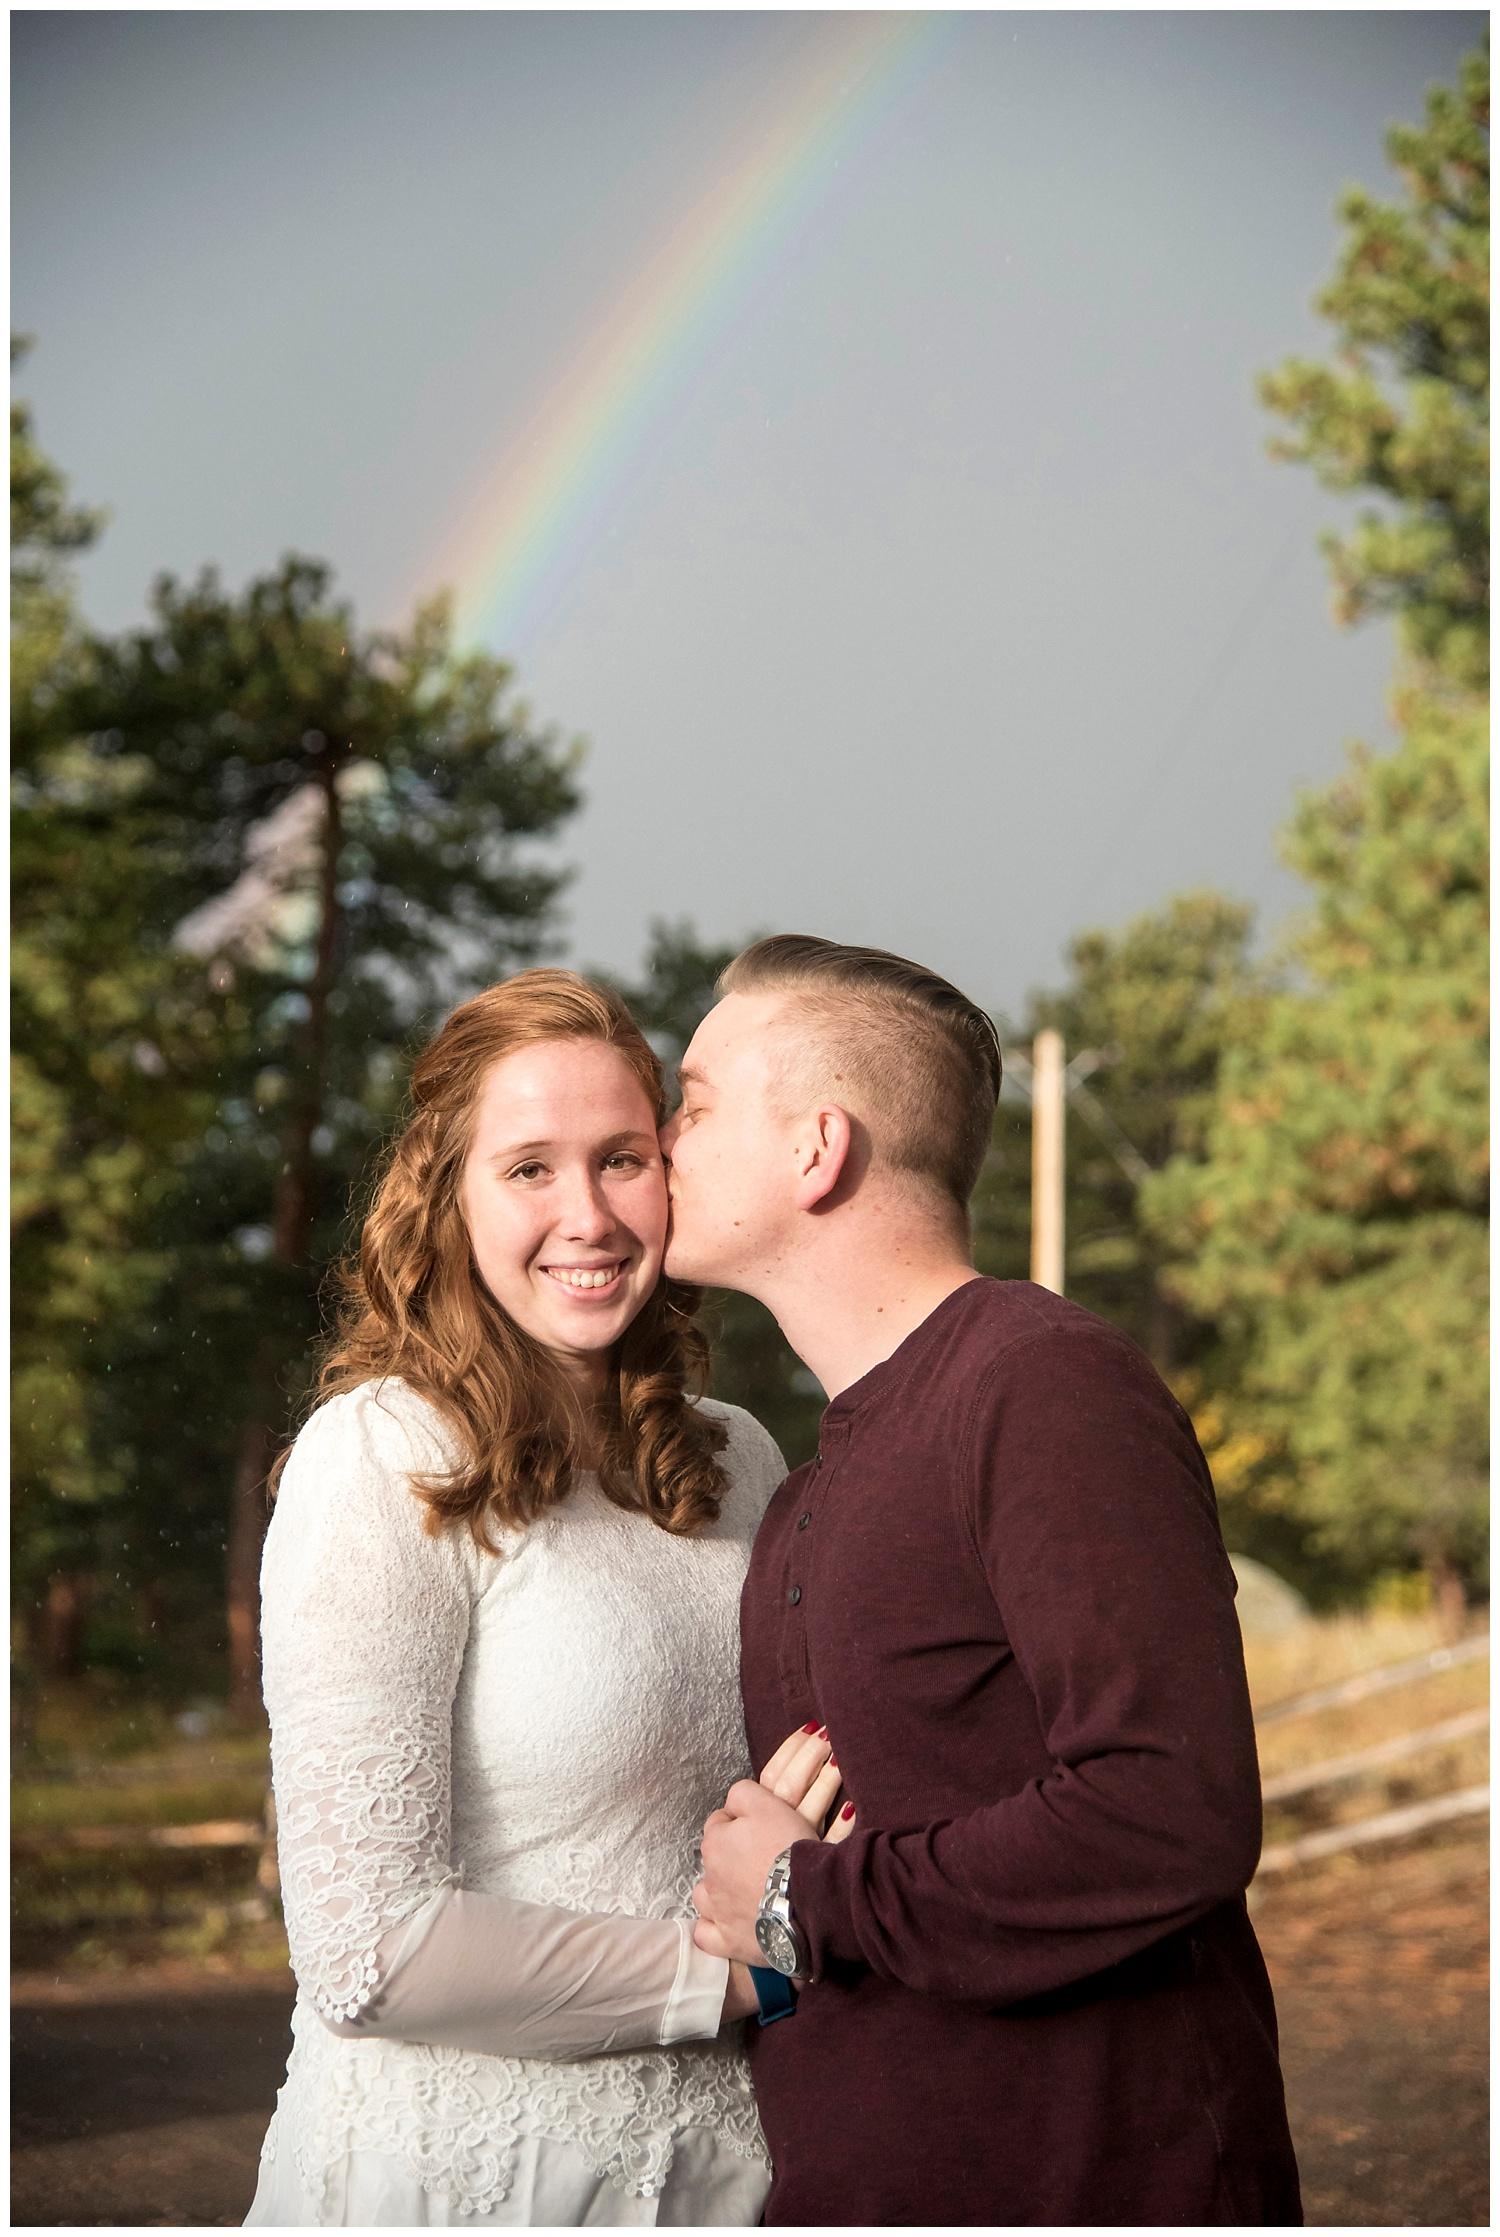 Man Kissing Woman with Rainbow | Don & Aliyah's Mountain Engagement Photography | Farm Wedding Photographer | Apollo Fields Wedding Wedding Photojournalism